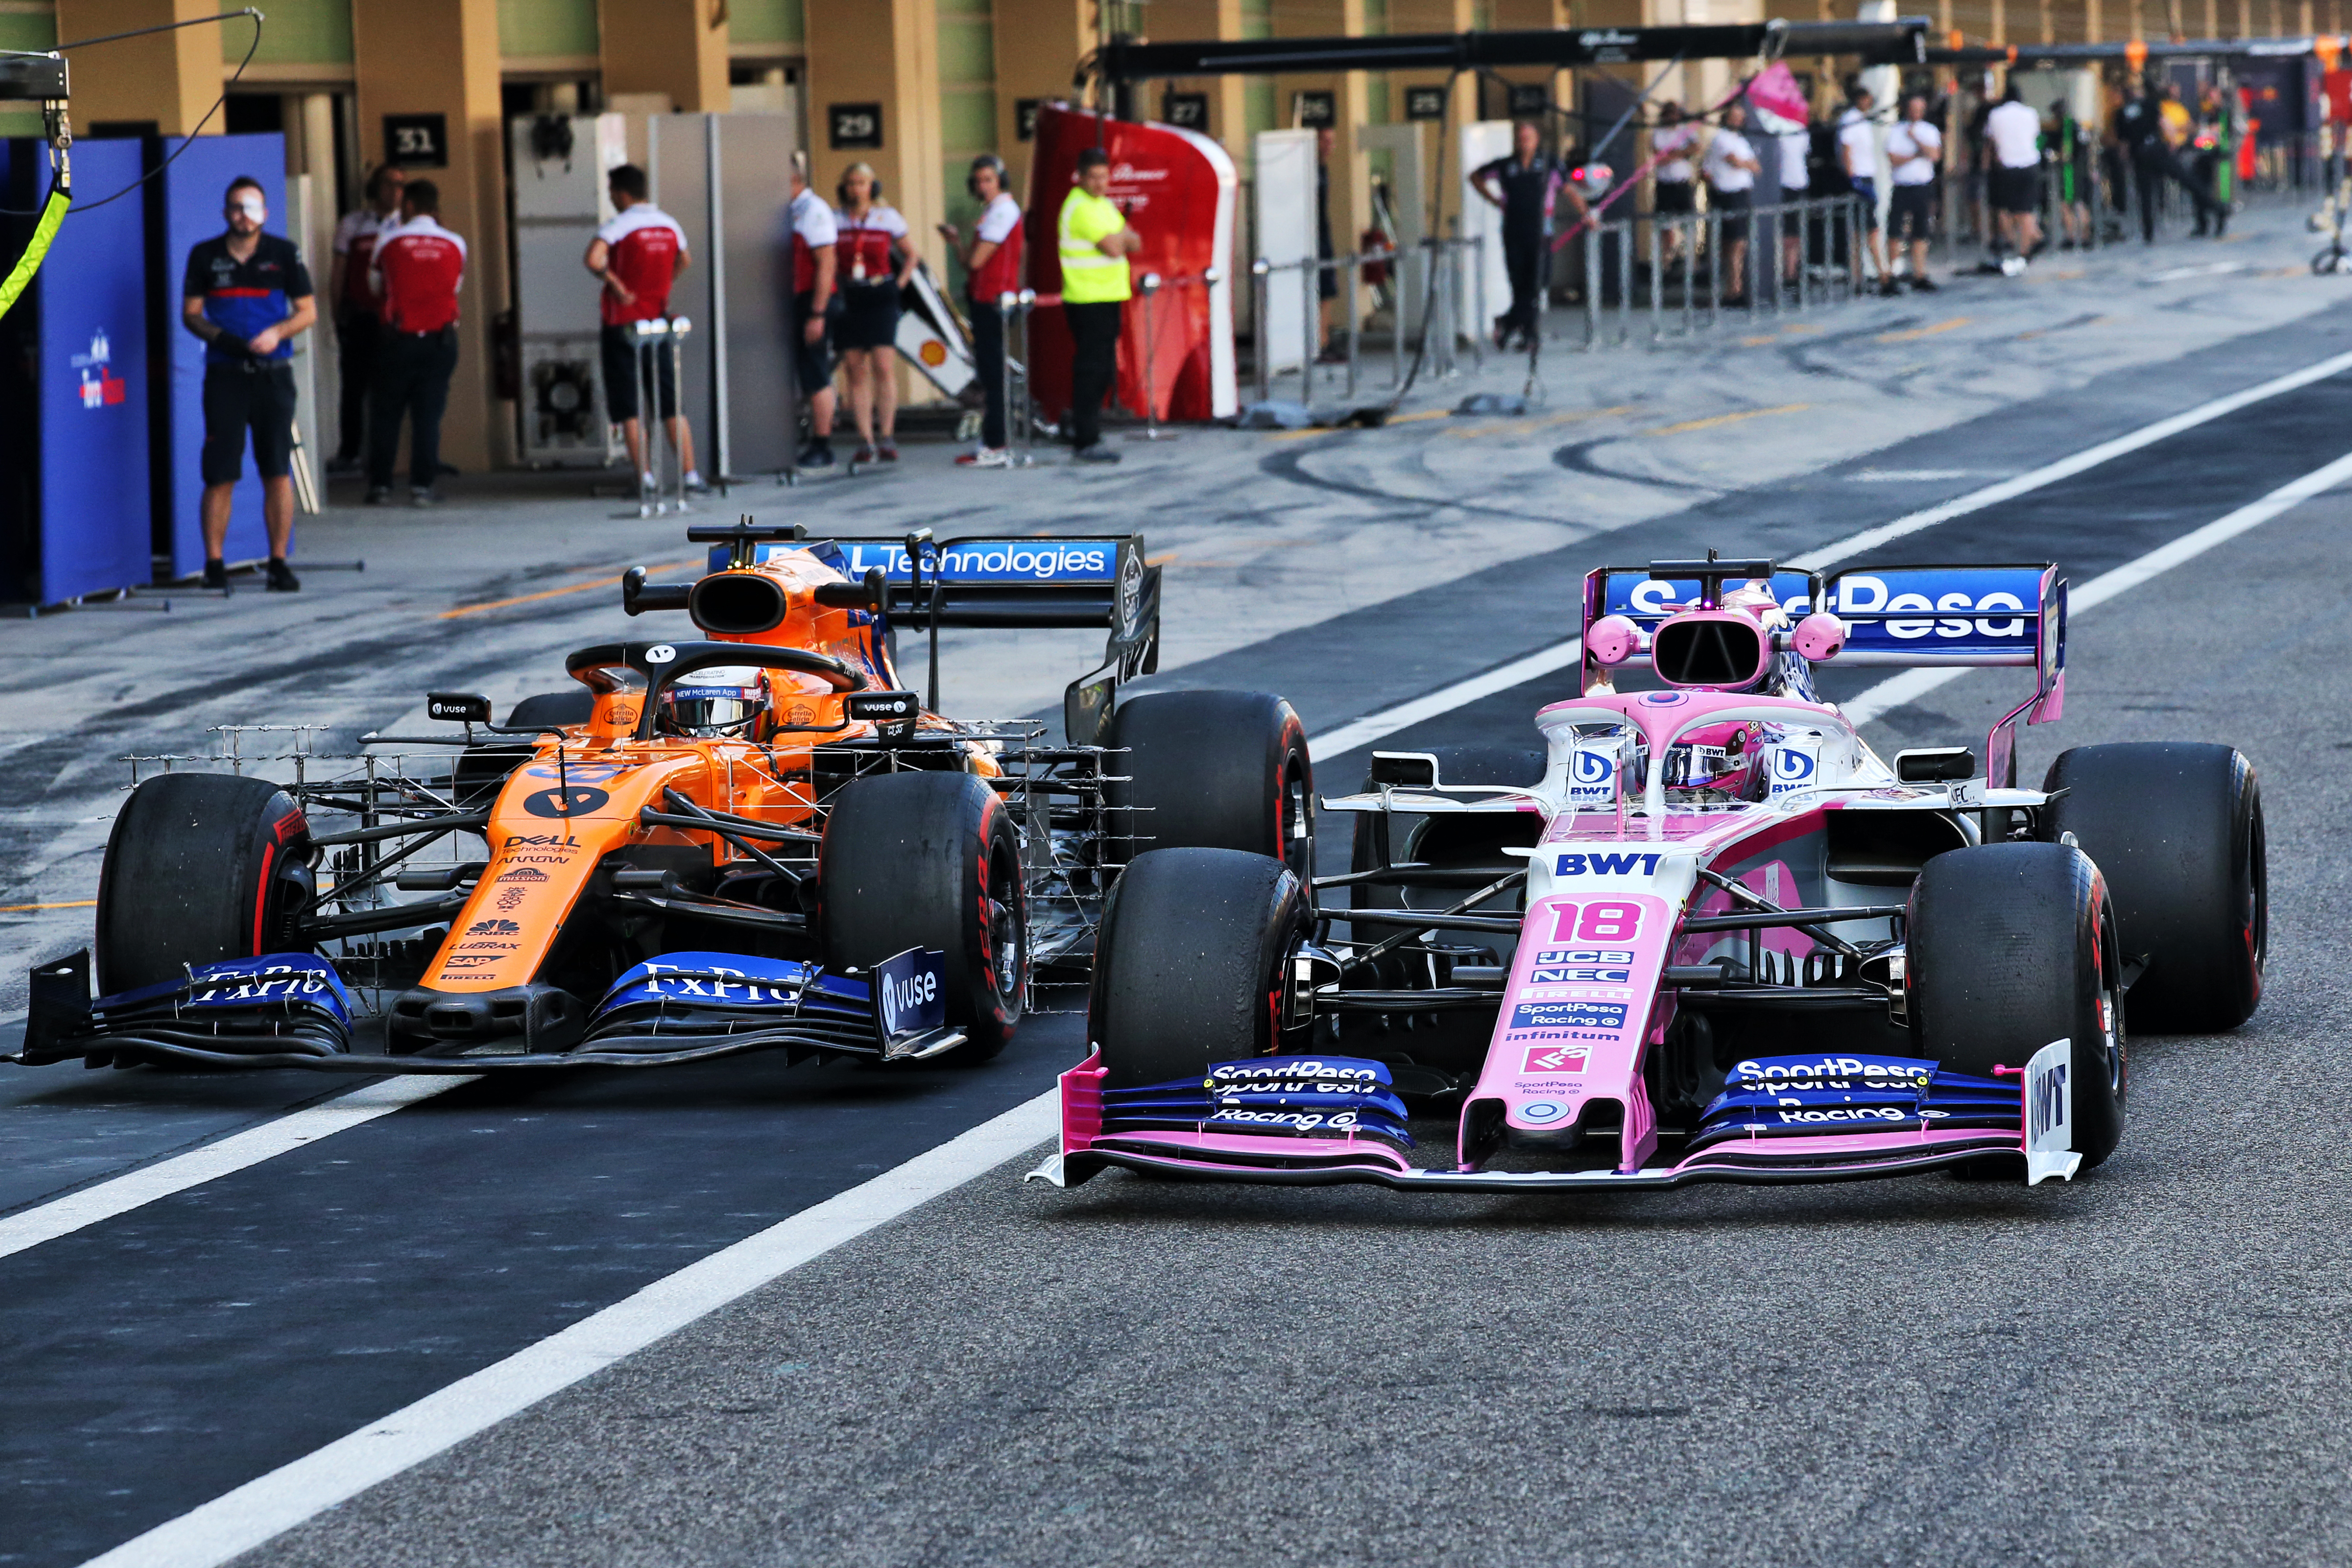 Racing Point McLaren F1 Abu Dhabi 2019